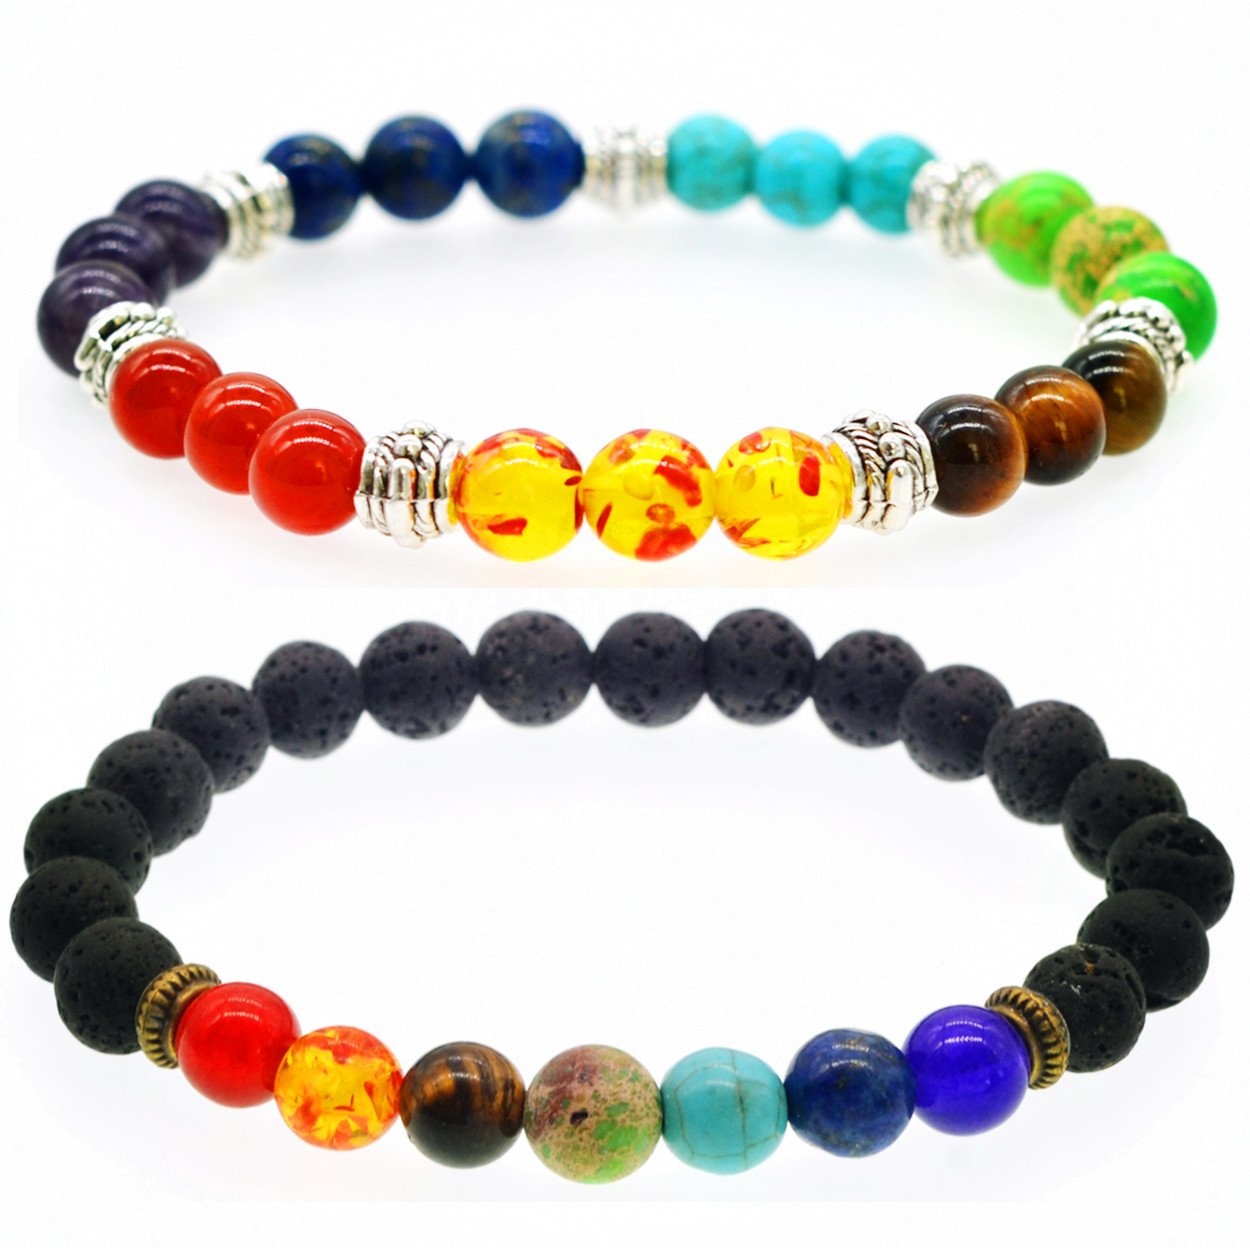 Mens Lava Chakra Beaded Bracelets Womens Healing Energy Lucky Stone Bracelets JOYA GIFT SB118488-CA